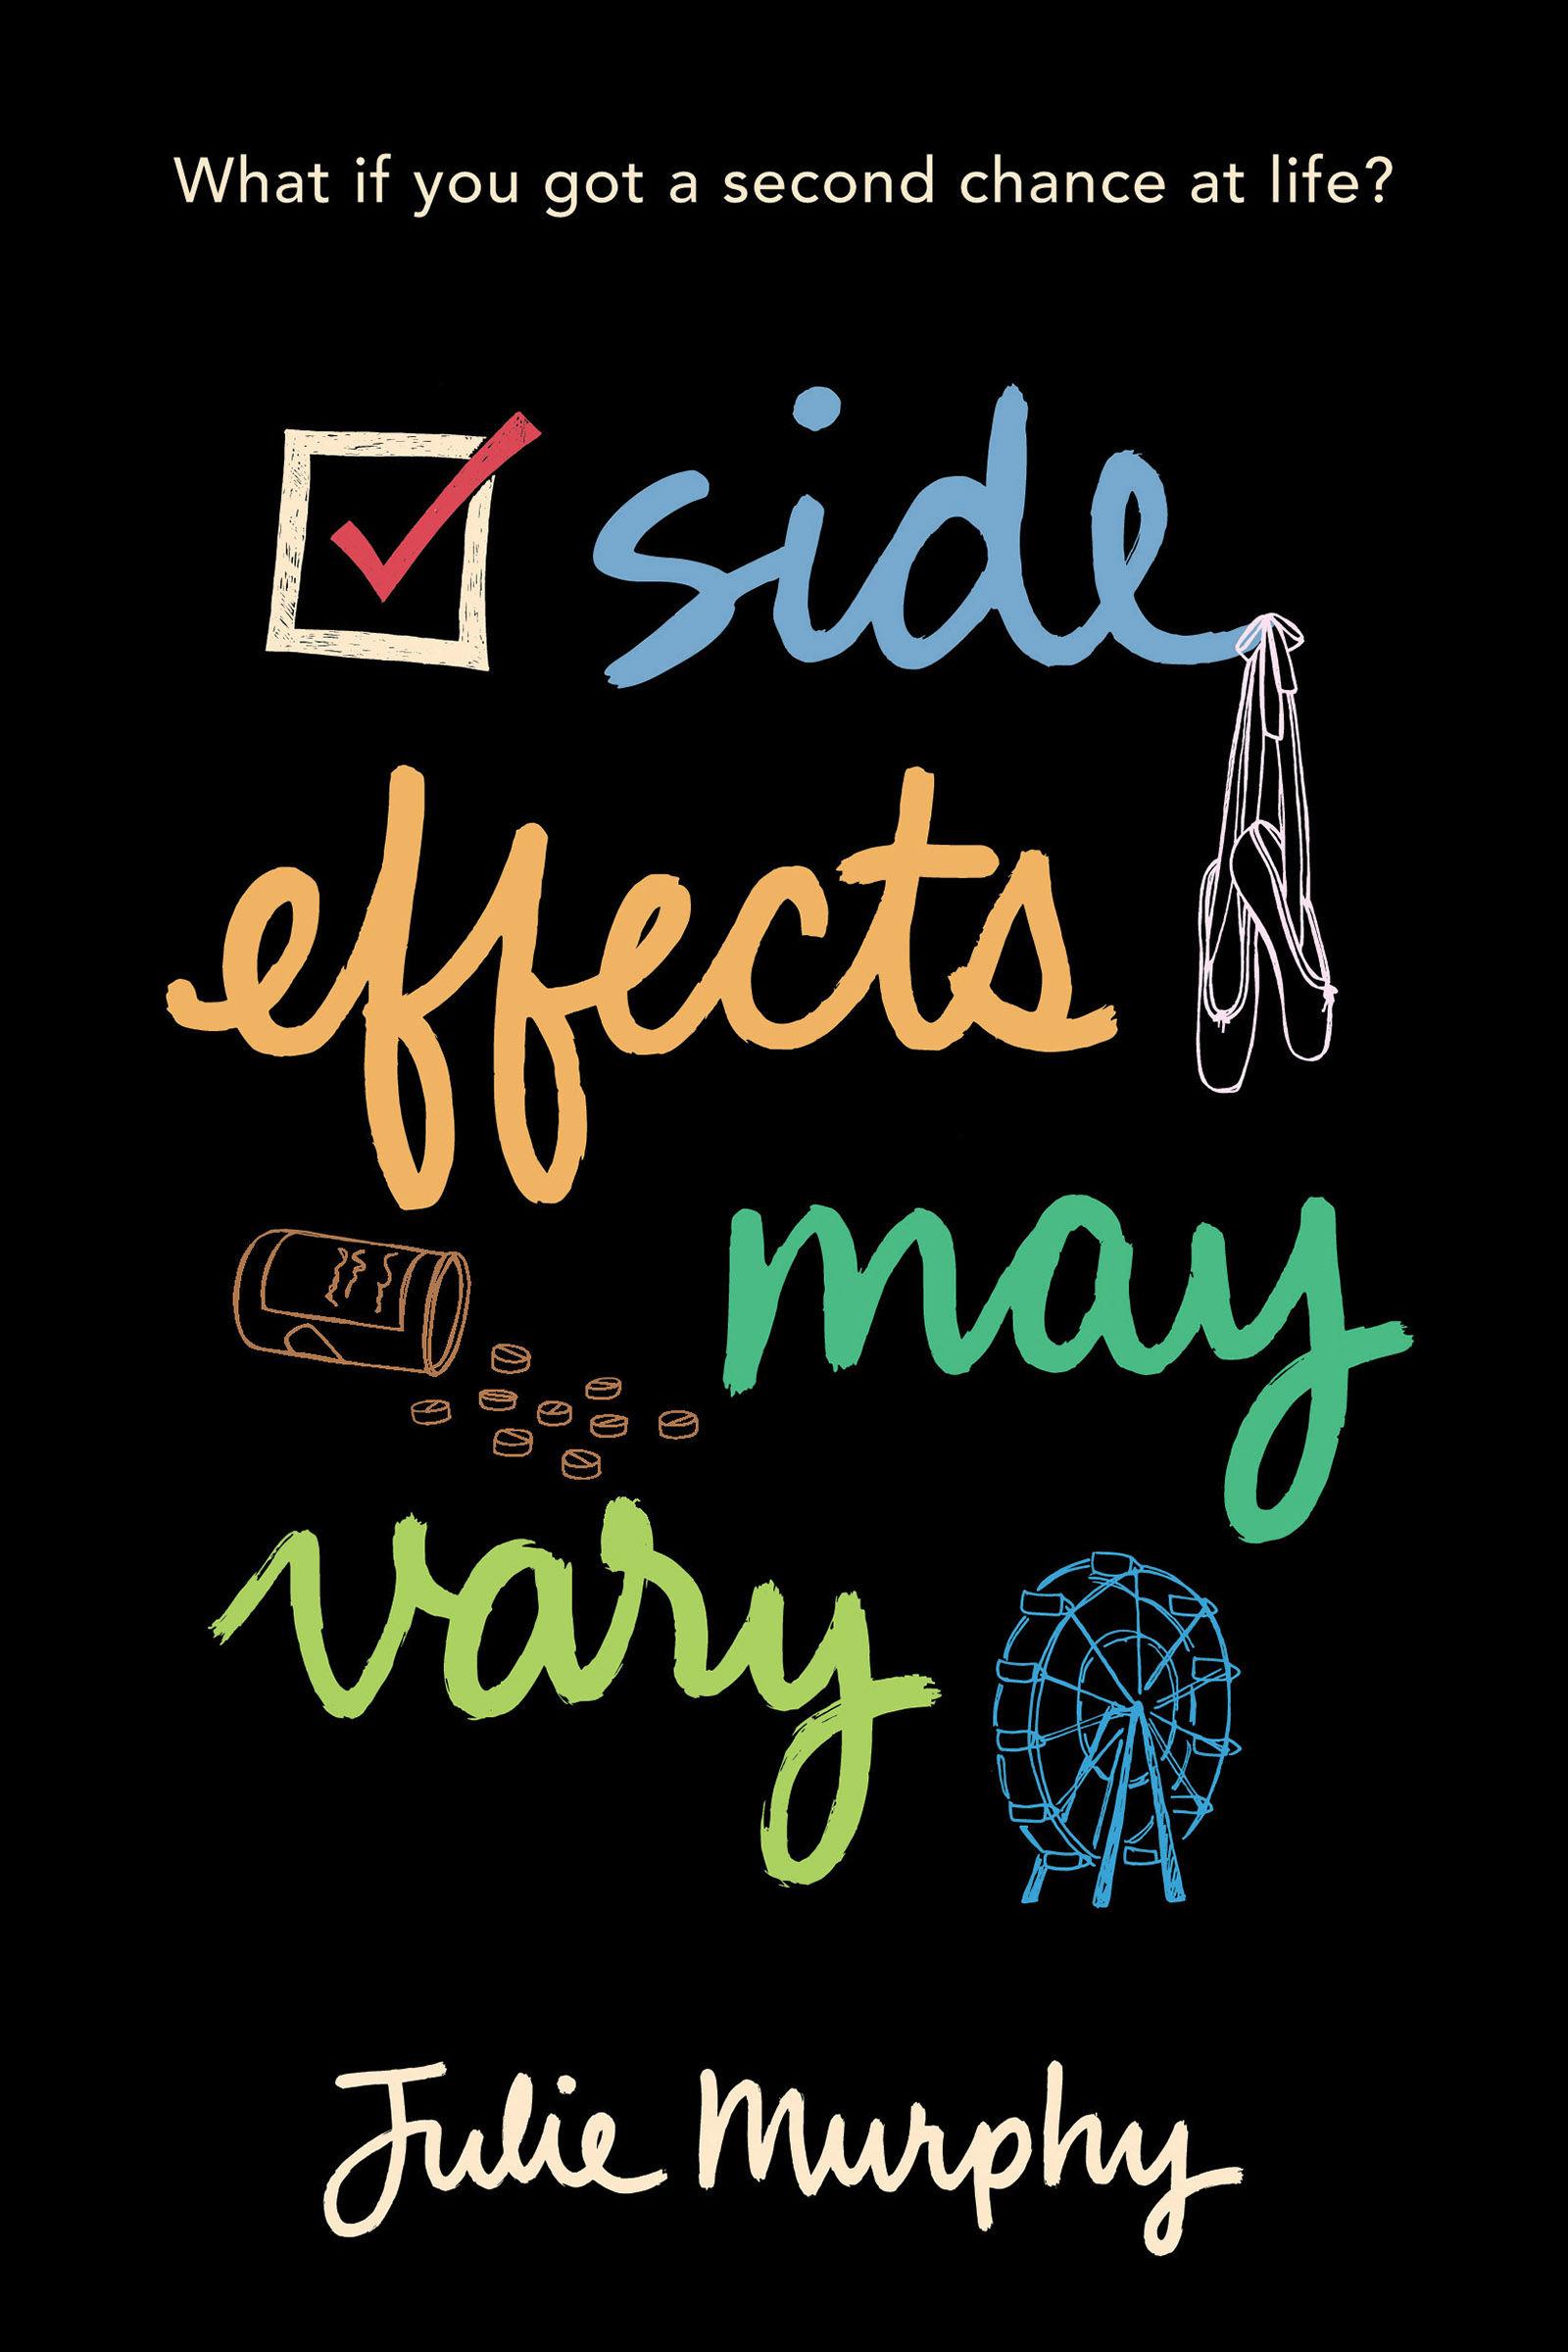 murphy-side-effect-may-vary.jpg